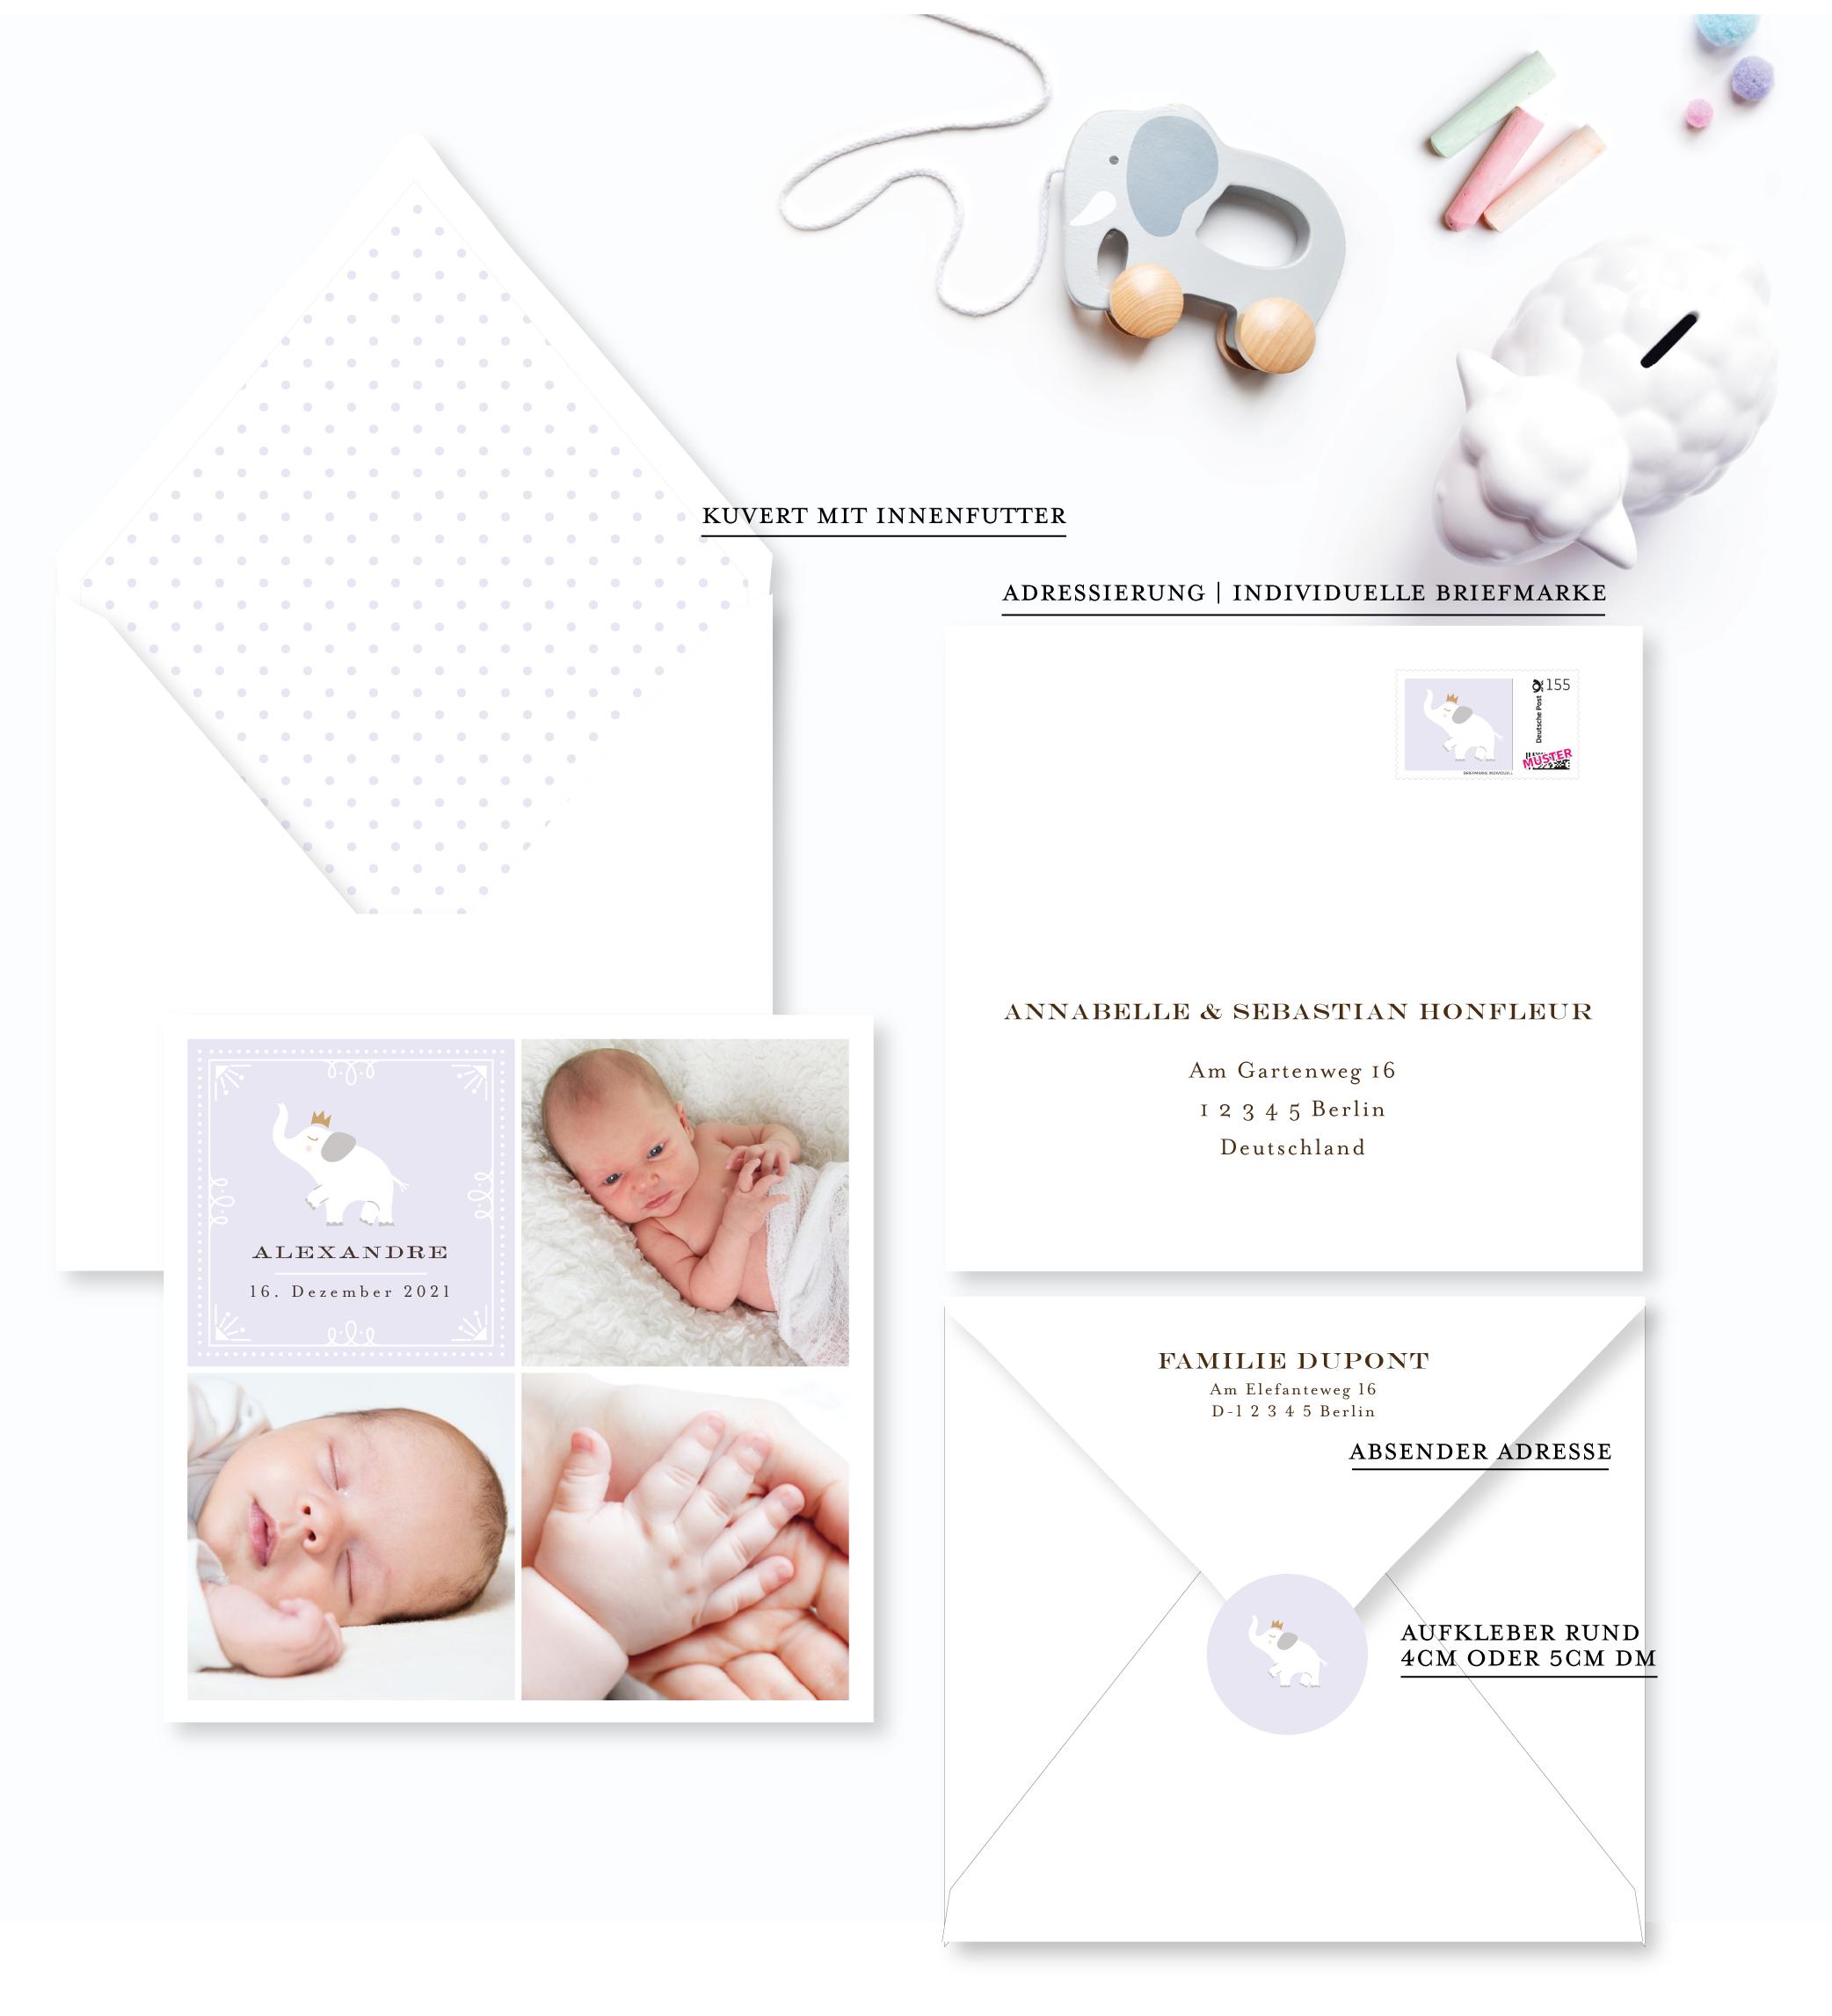 geburtskarte baby elefant für Junge farbe Lila